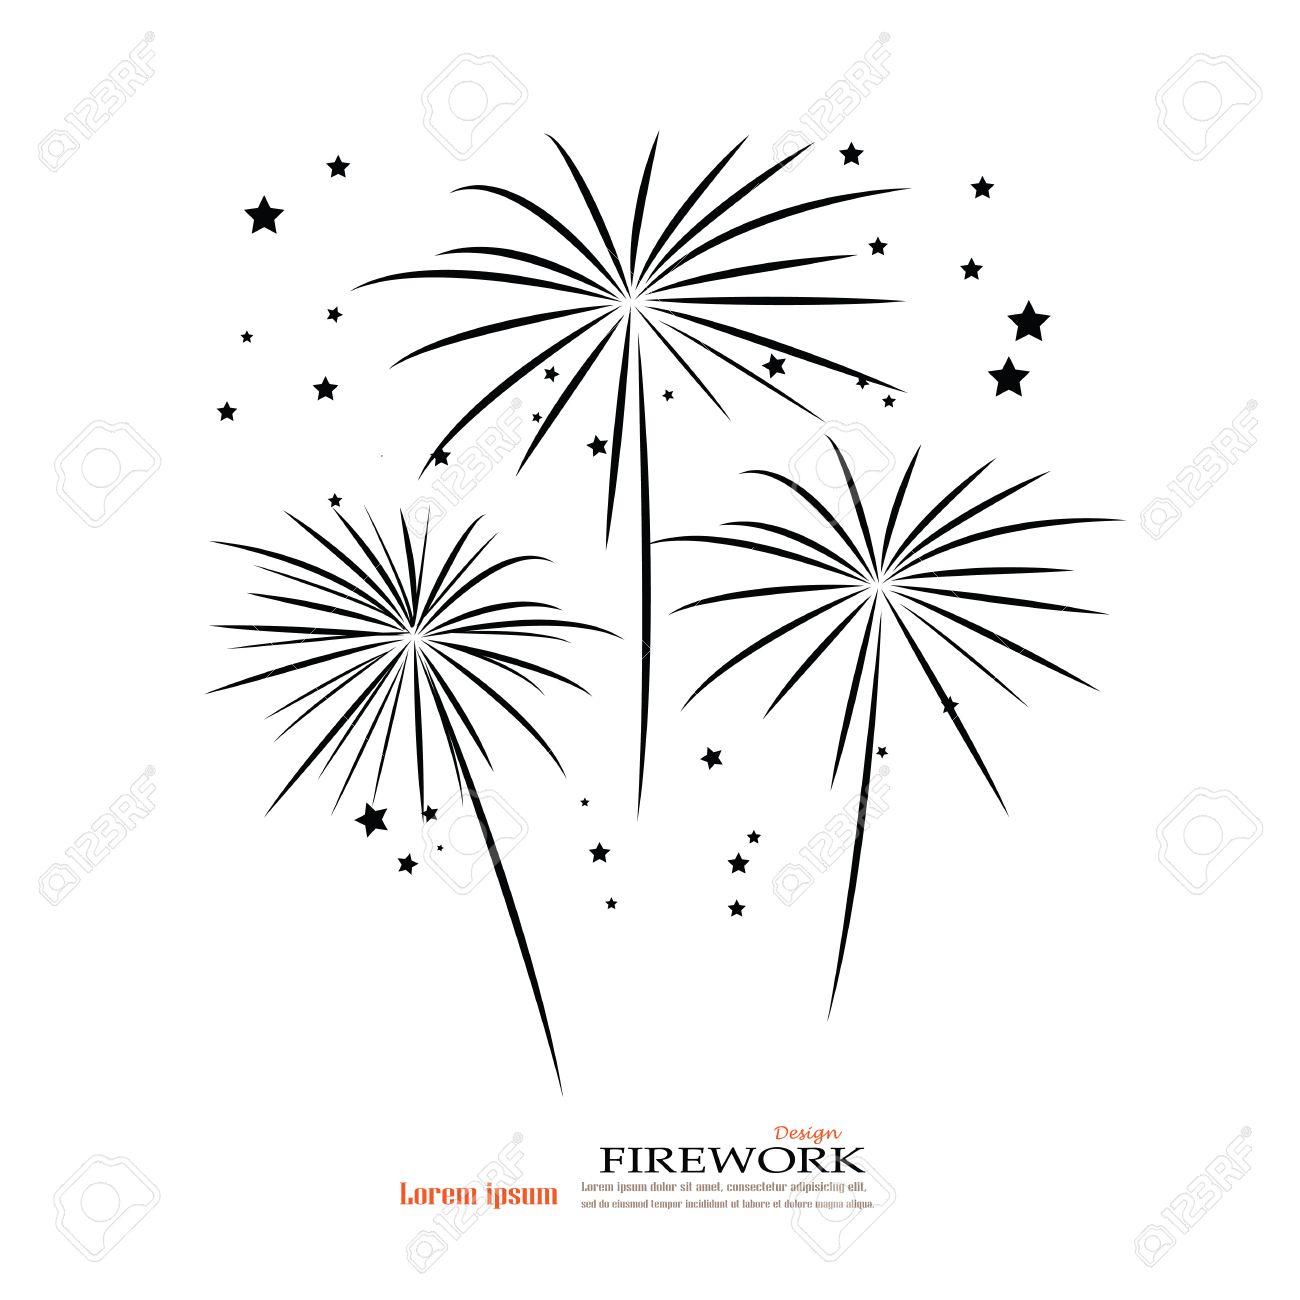 firework design on white background firework firework vector vector rh 123rf com Fireworks Transparent Background American Fireworks